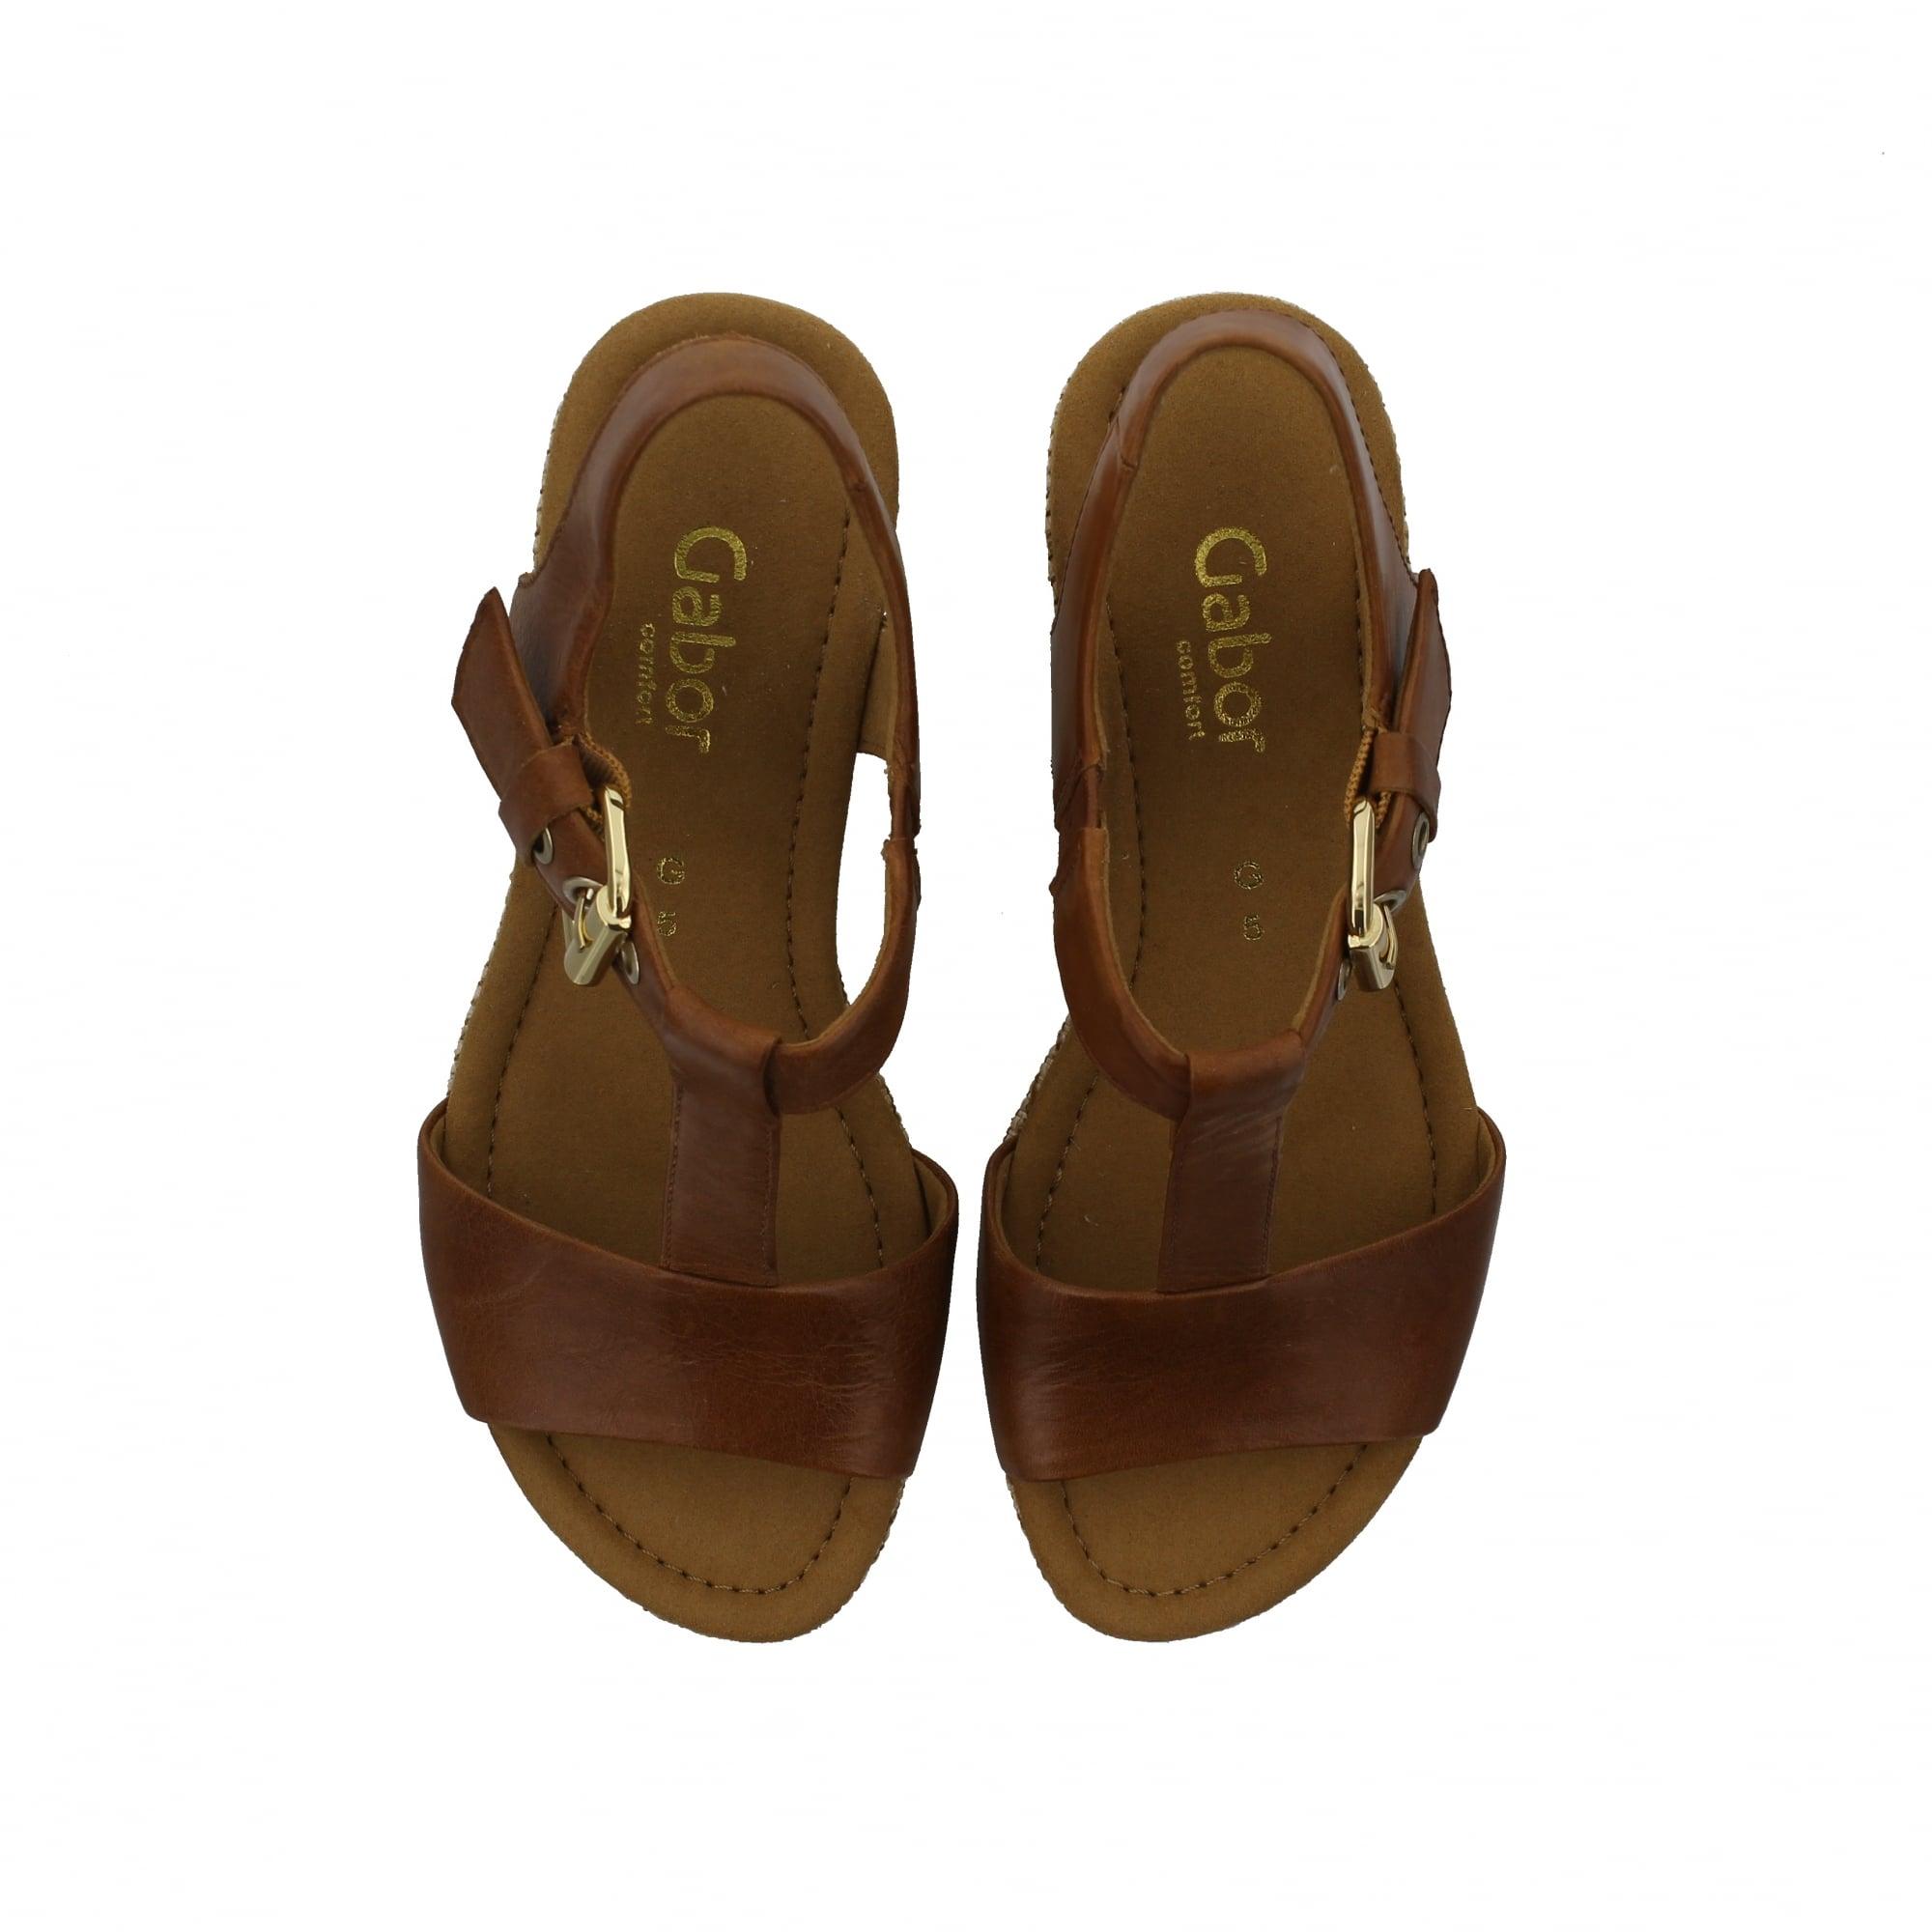 519a9c82e Gabor Karen 22-824-54 Tan Leather Womens Sandals